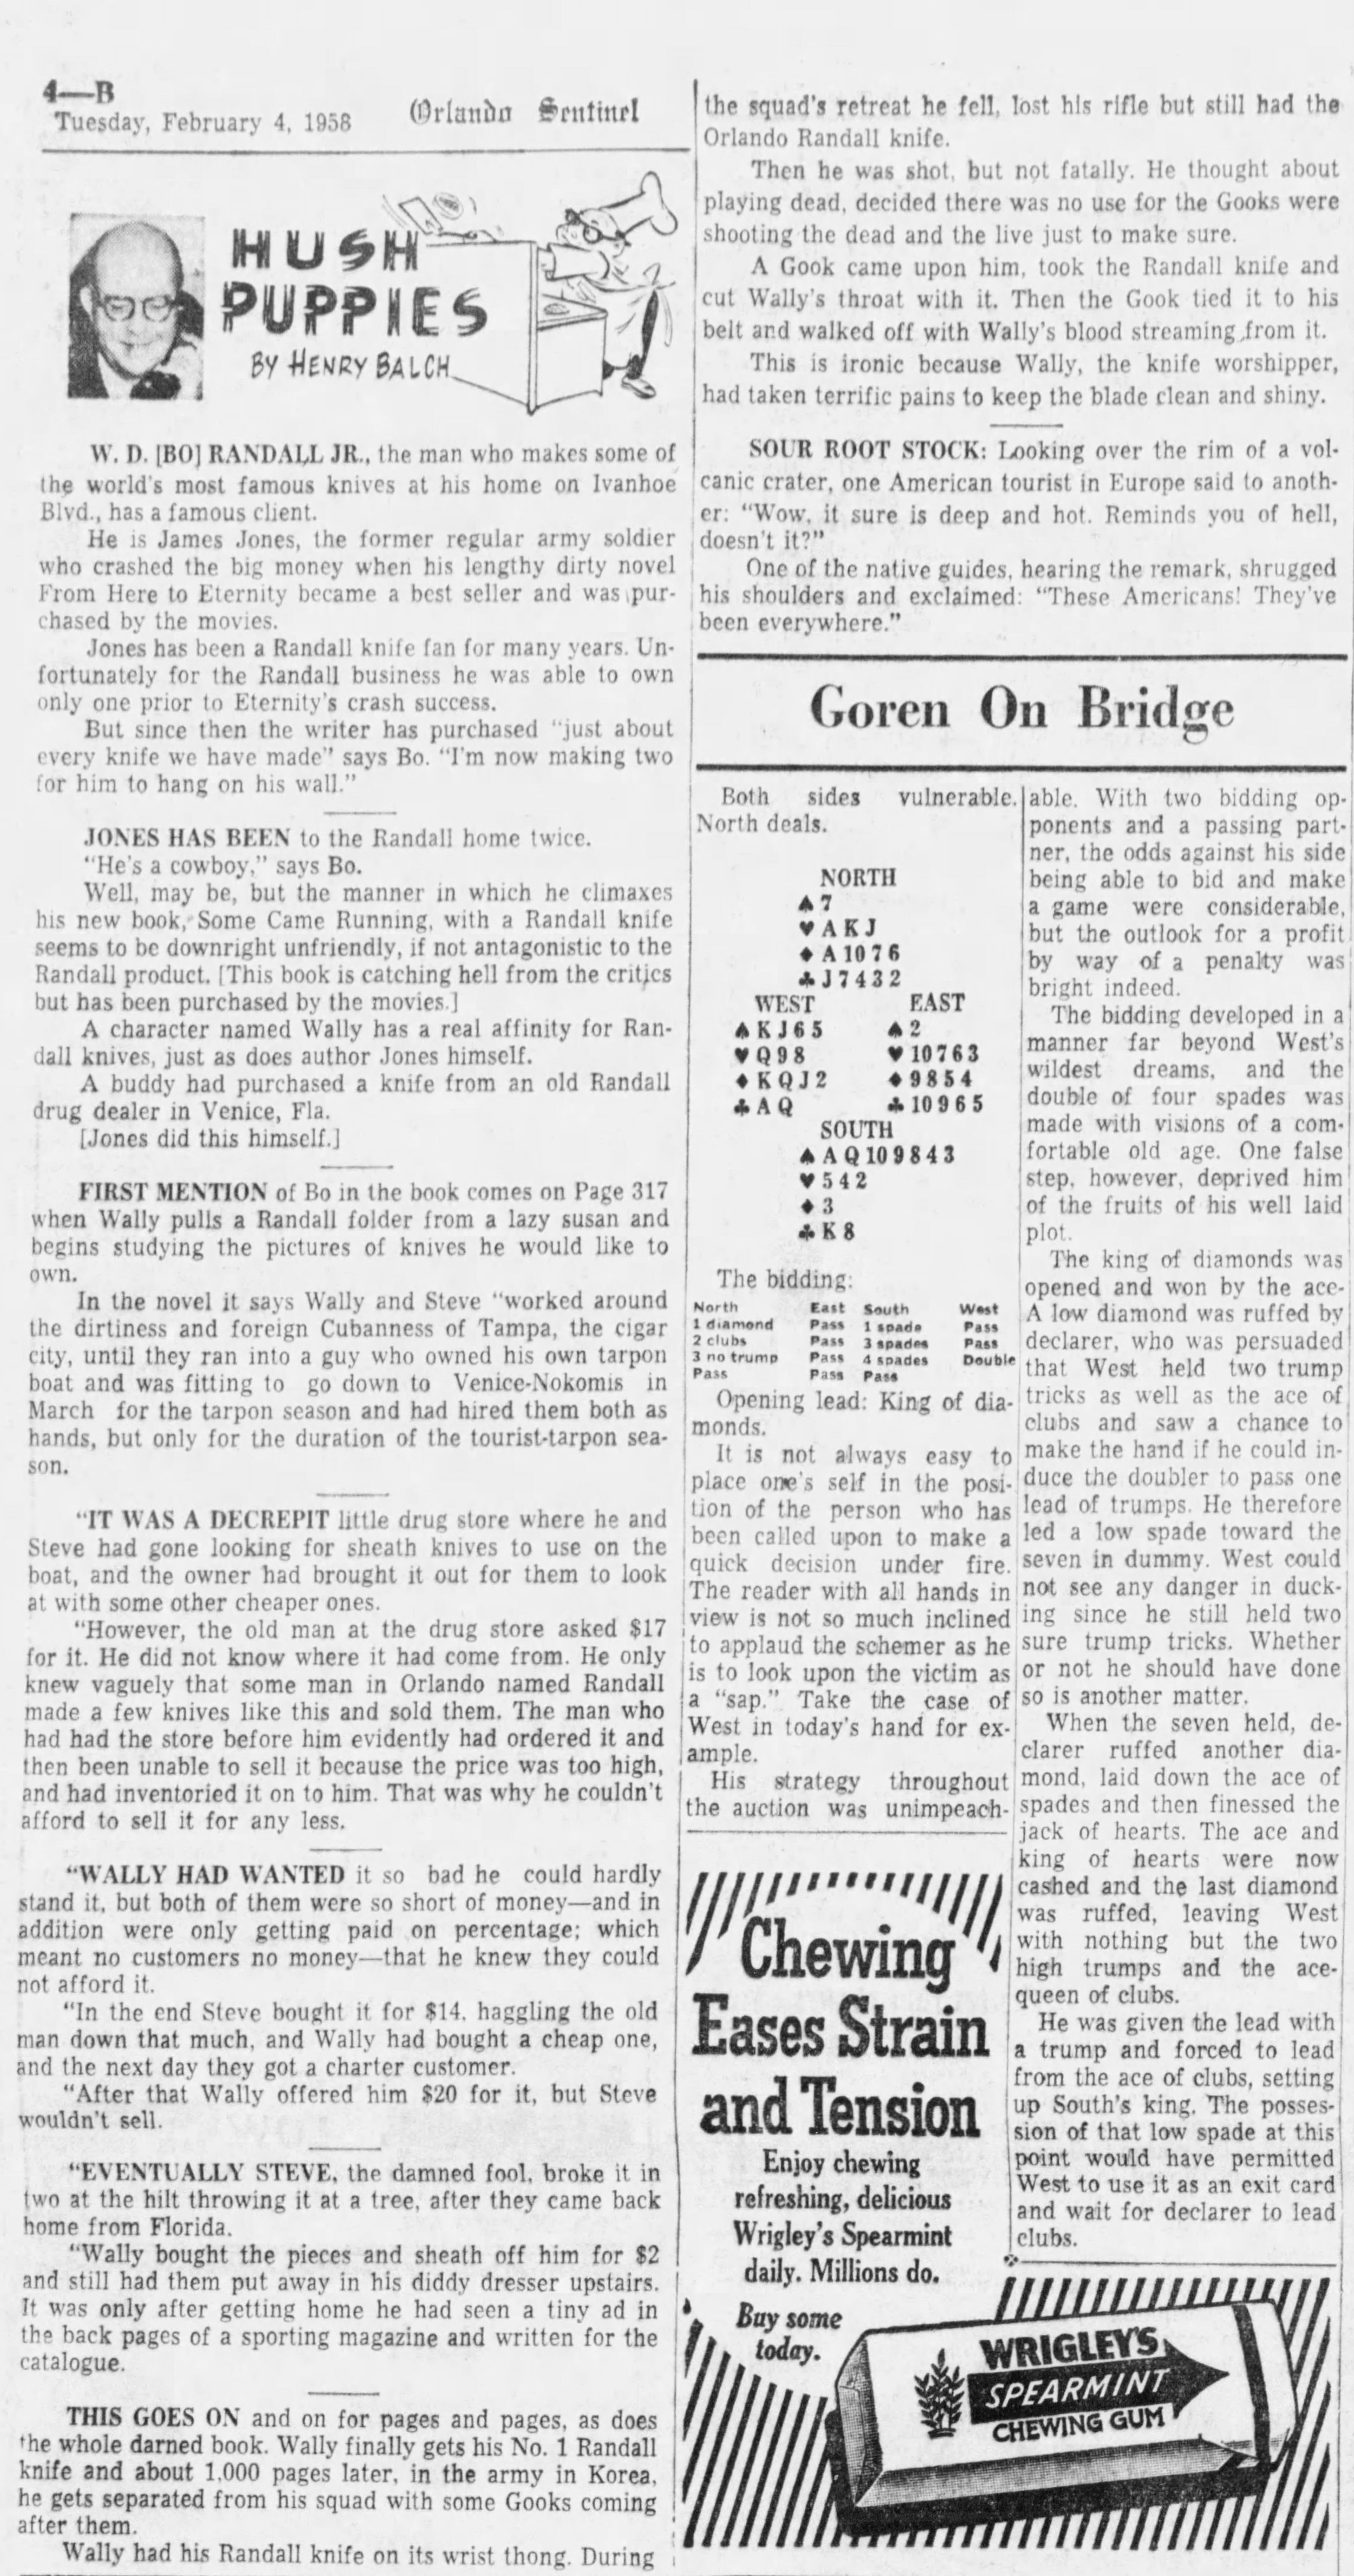 The_Orlando_Sentinel_Tue__Feb_4__1958_.jpg